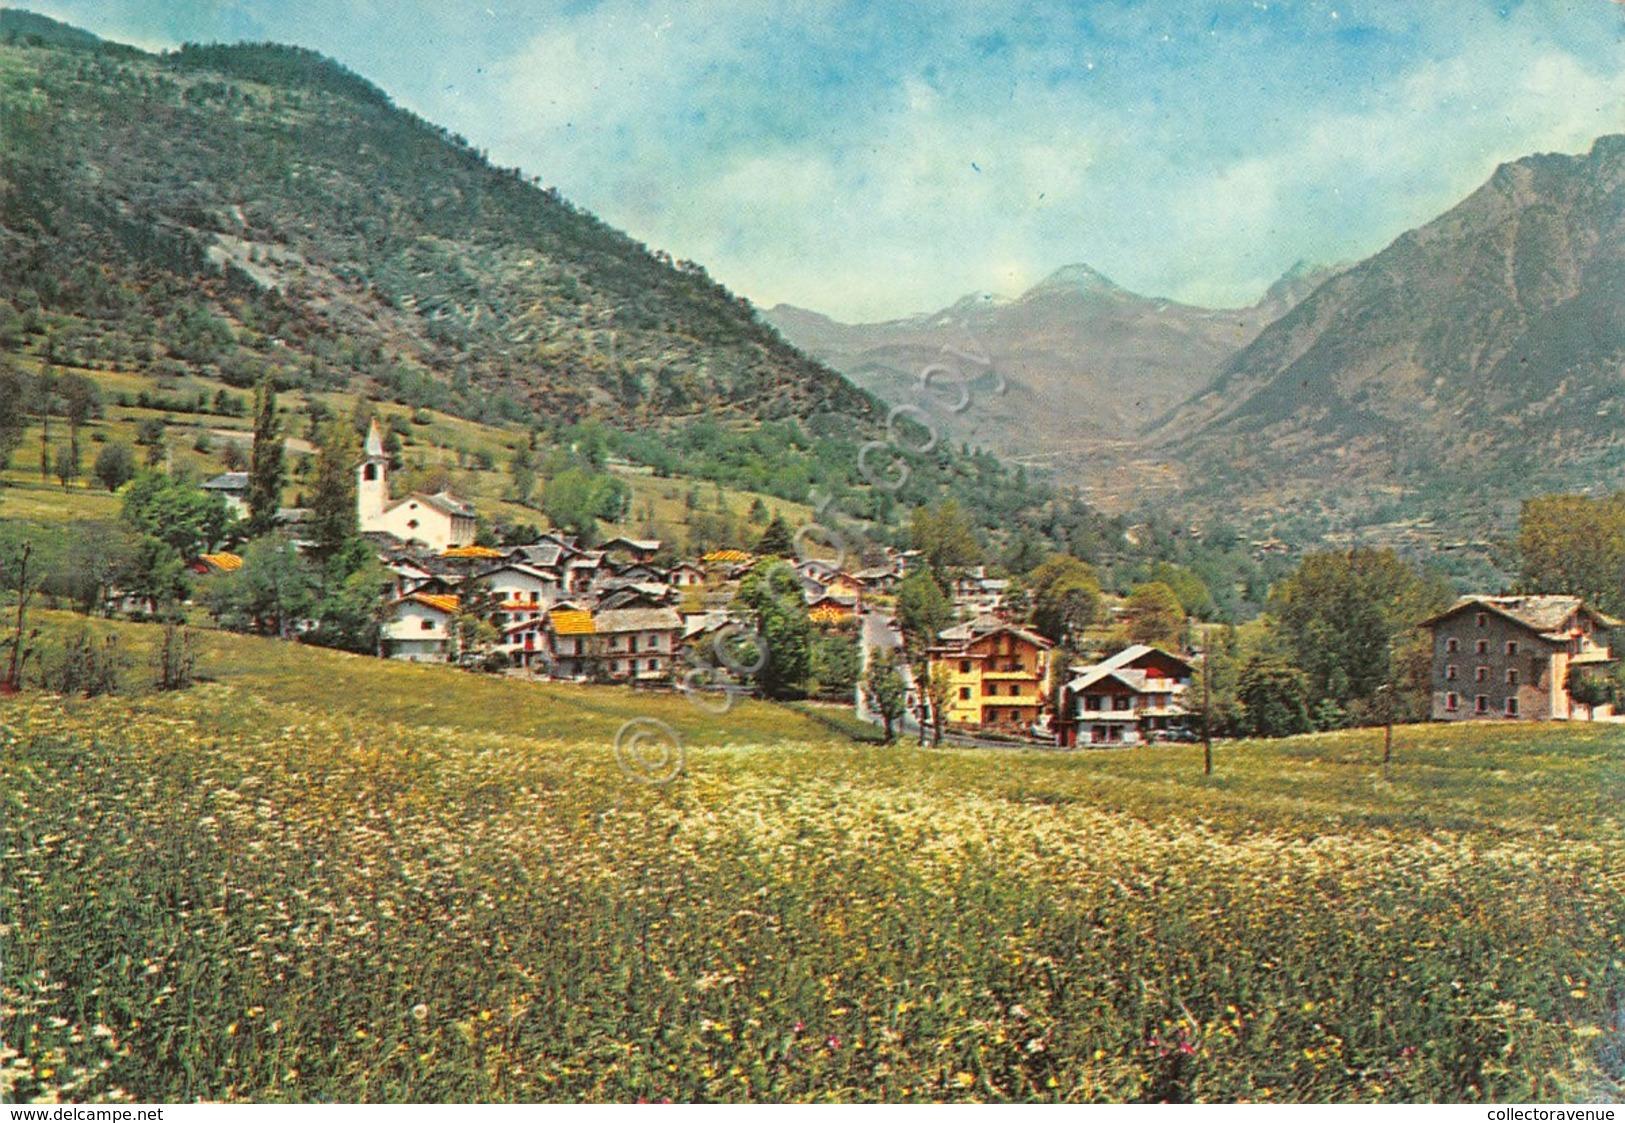 Cartolina Challant St. Anselm Panorama 1966 - Italy